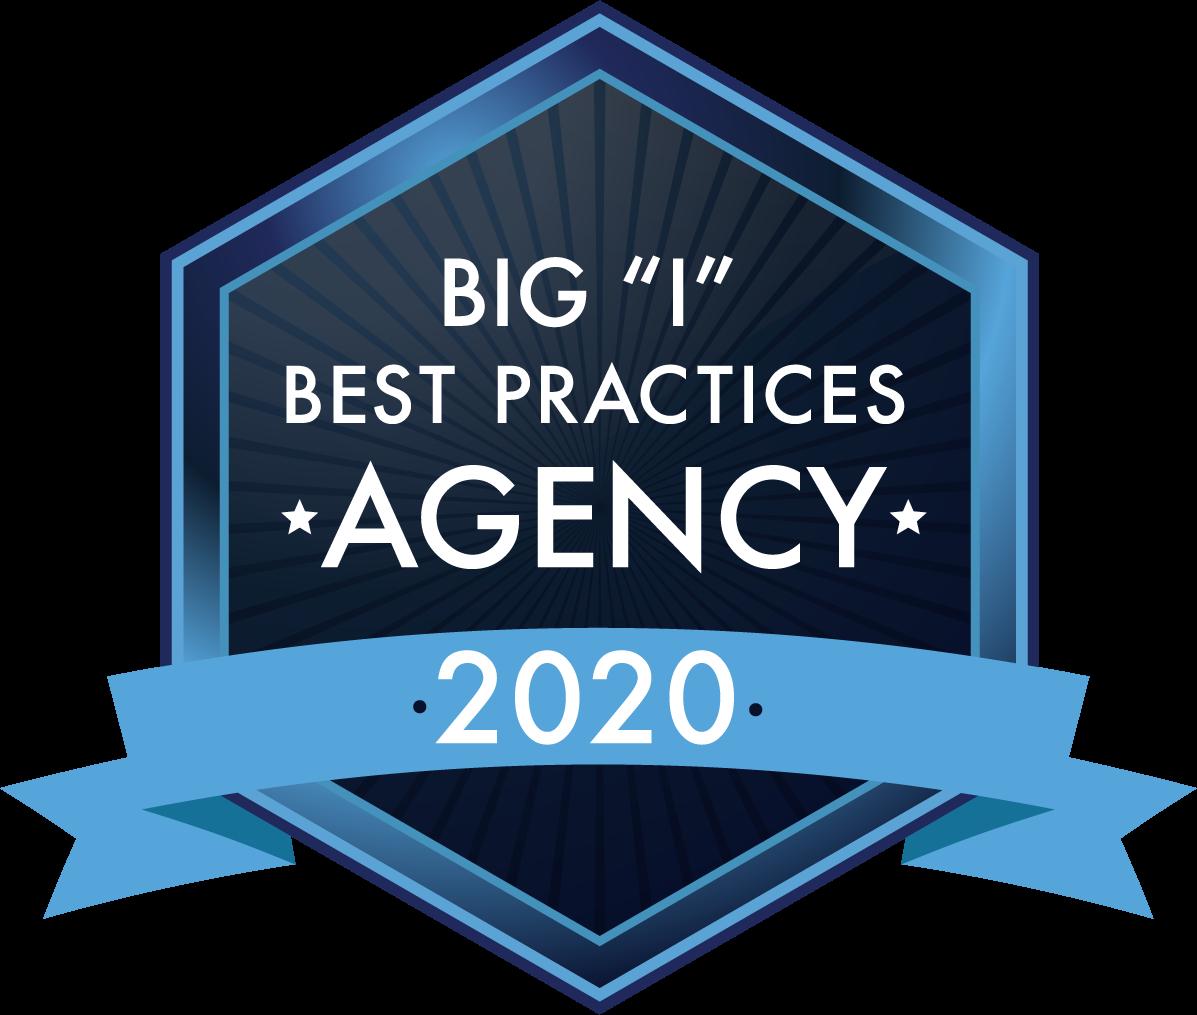 "Big ""I"" Best Practices Agency - 2020"